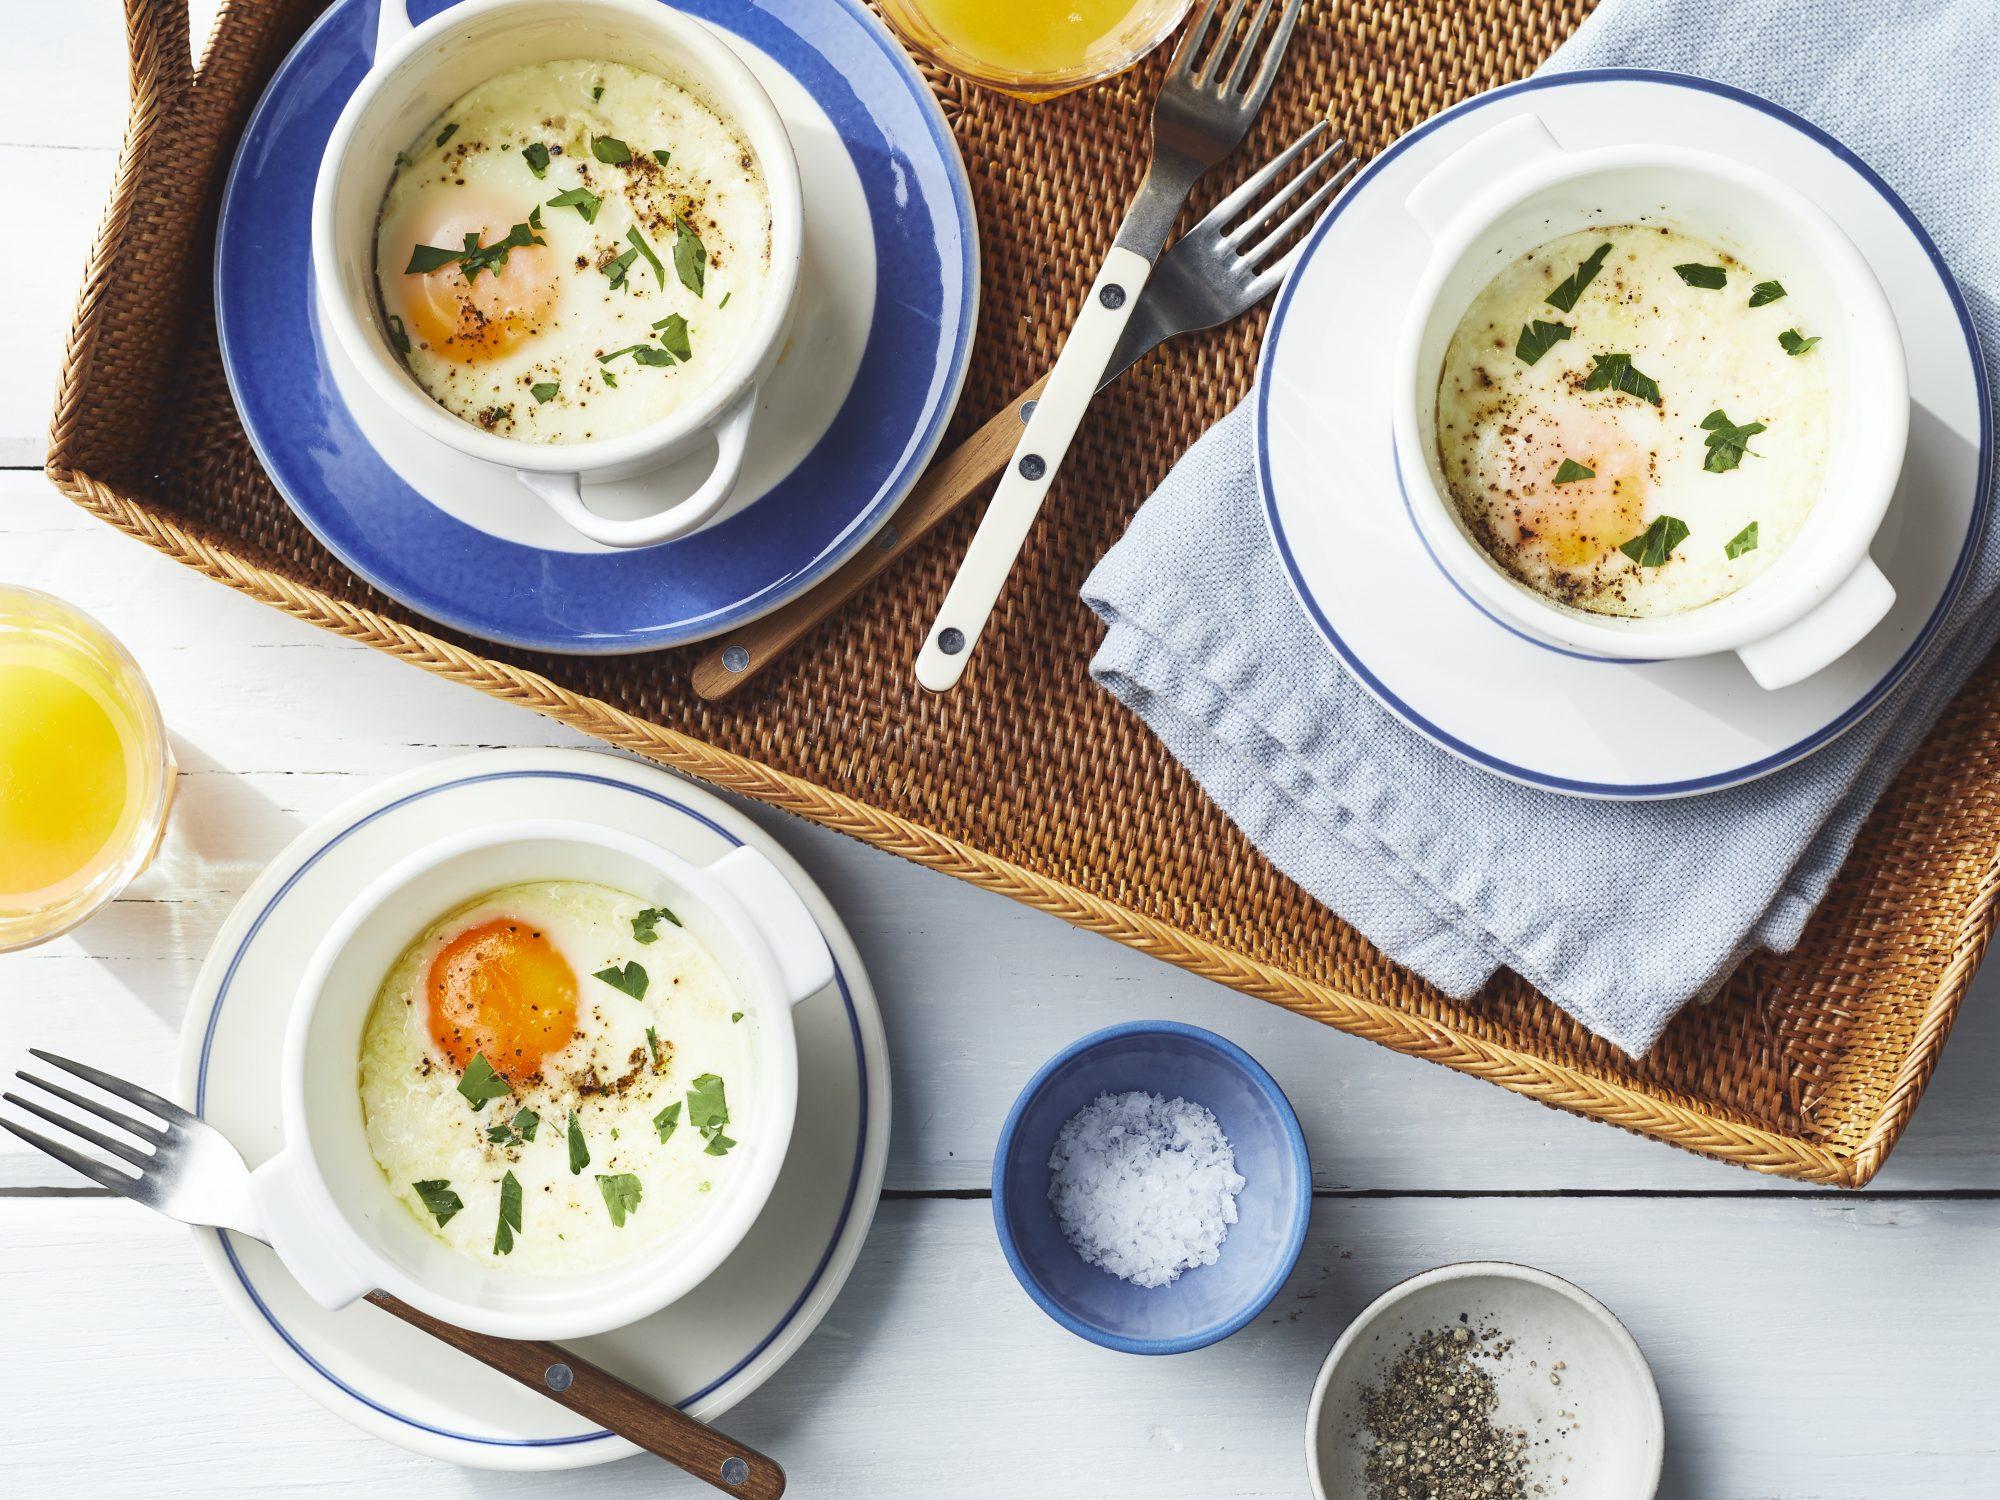 mr-simple-baked-eggs